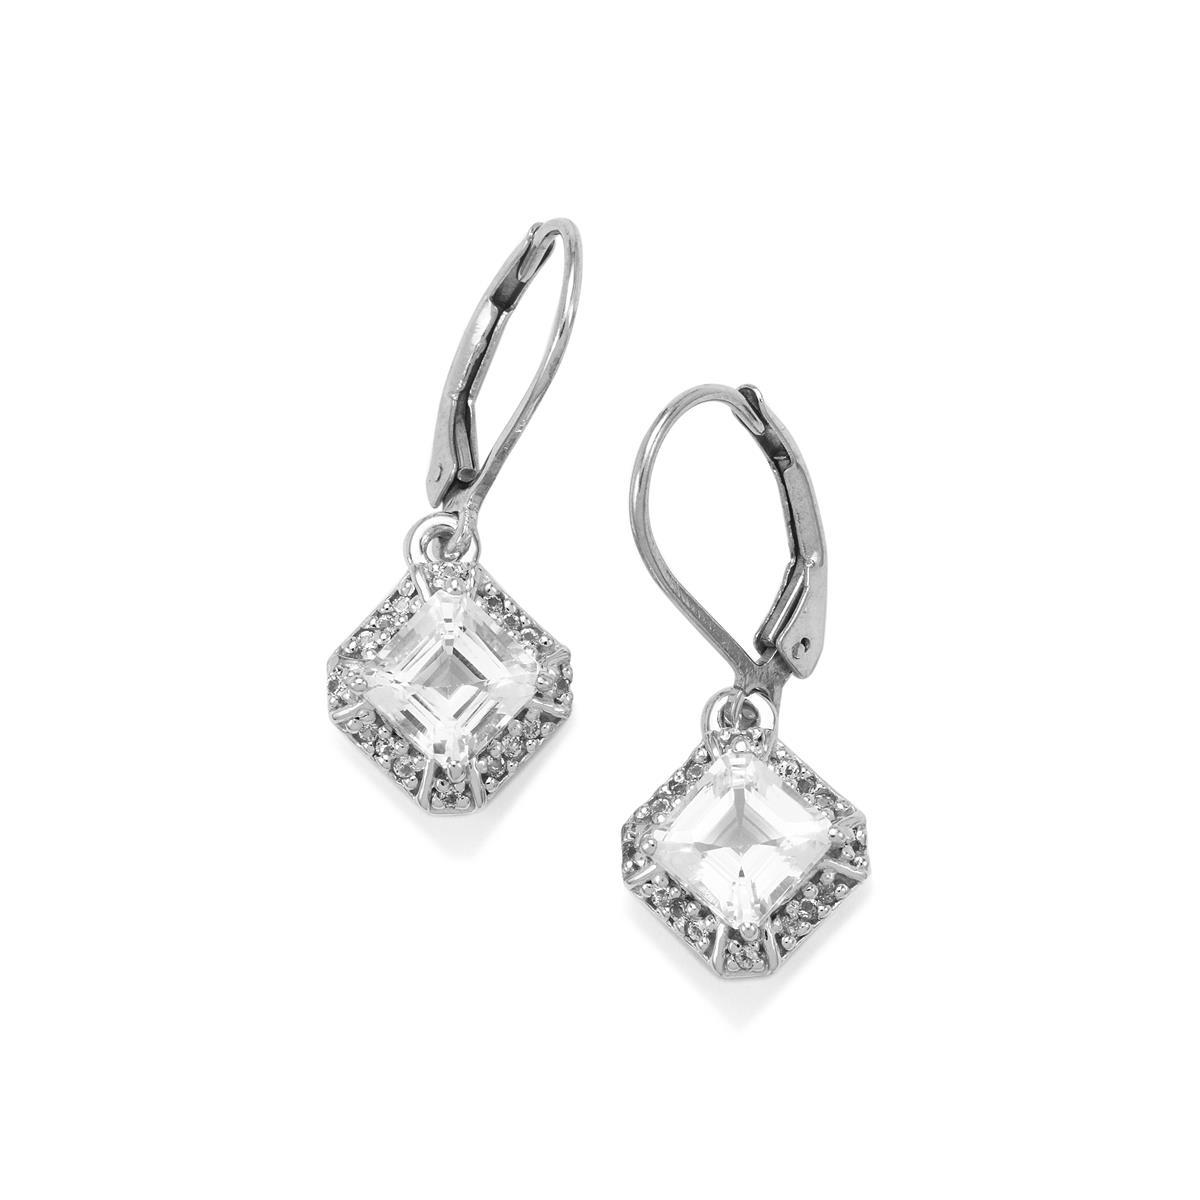 White Topaz Earrings In Sterling Silver 2 92cts